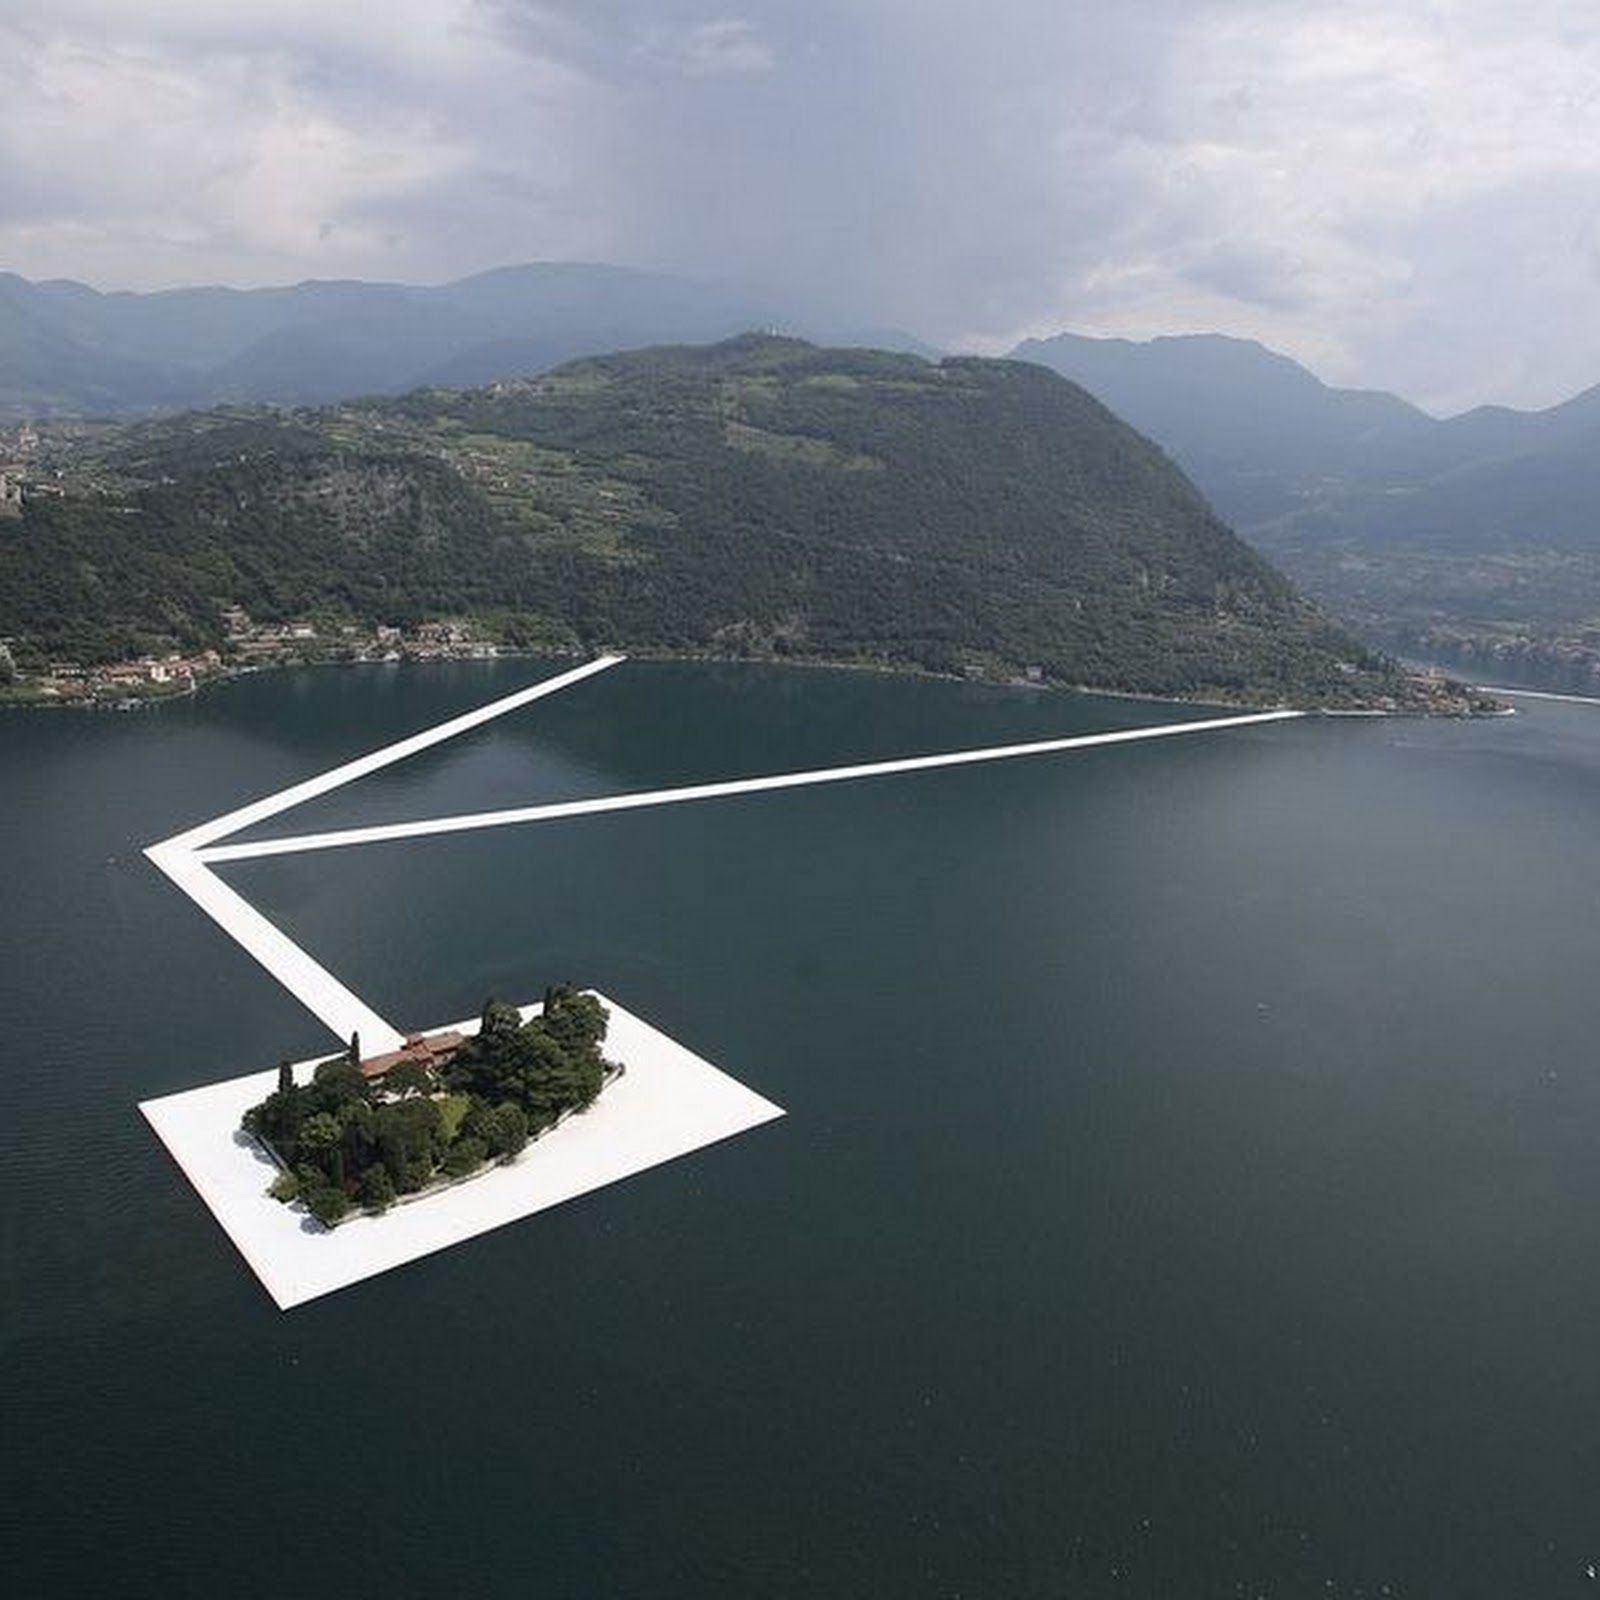 Artist Installs Floating Piers on Italian Lake